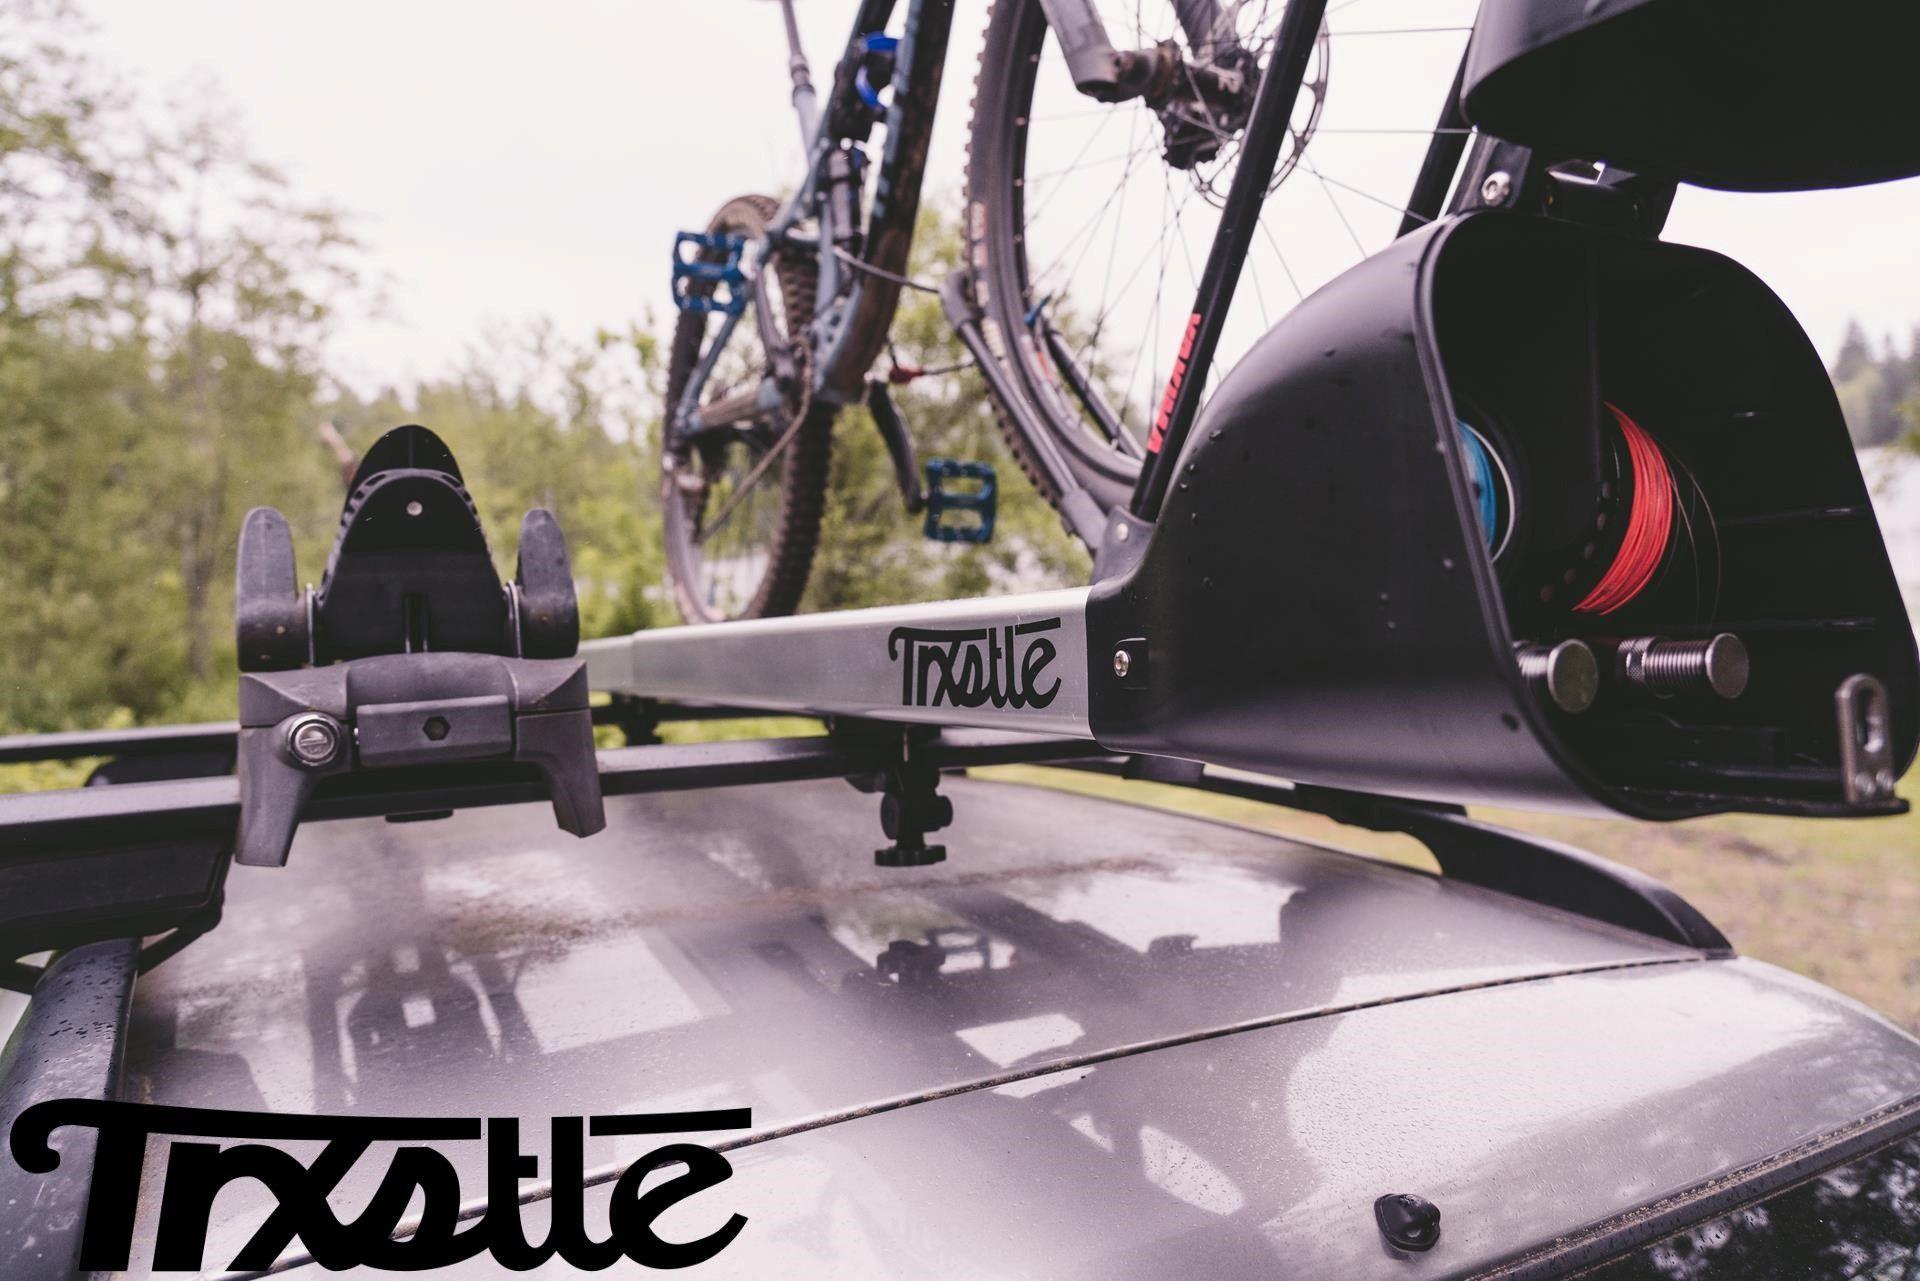 CRC System v2.0 Fly fishing, Fishing photos, Bikepacking